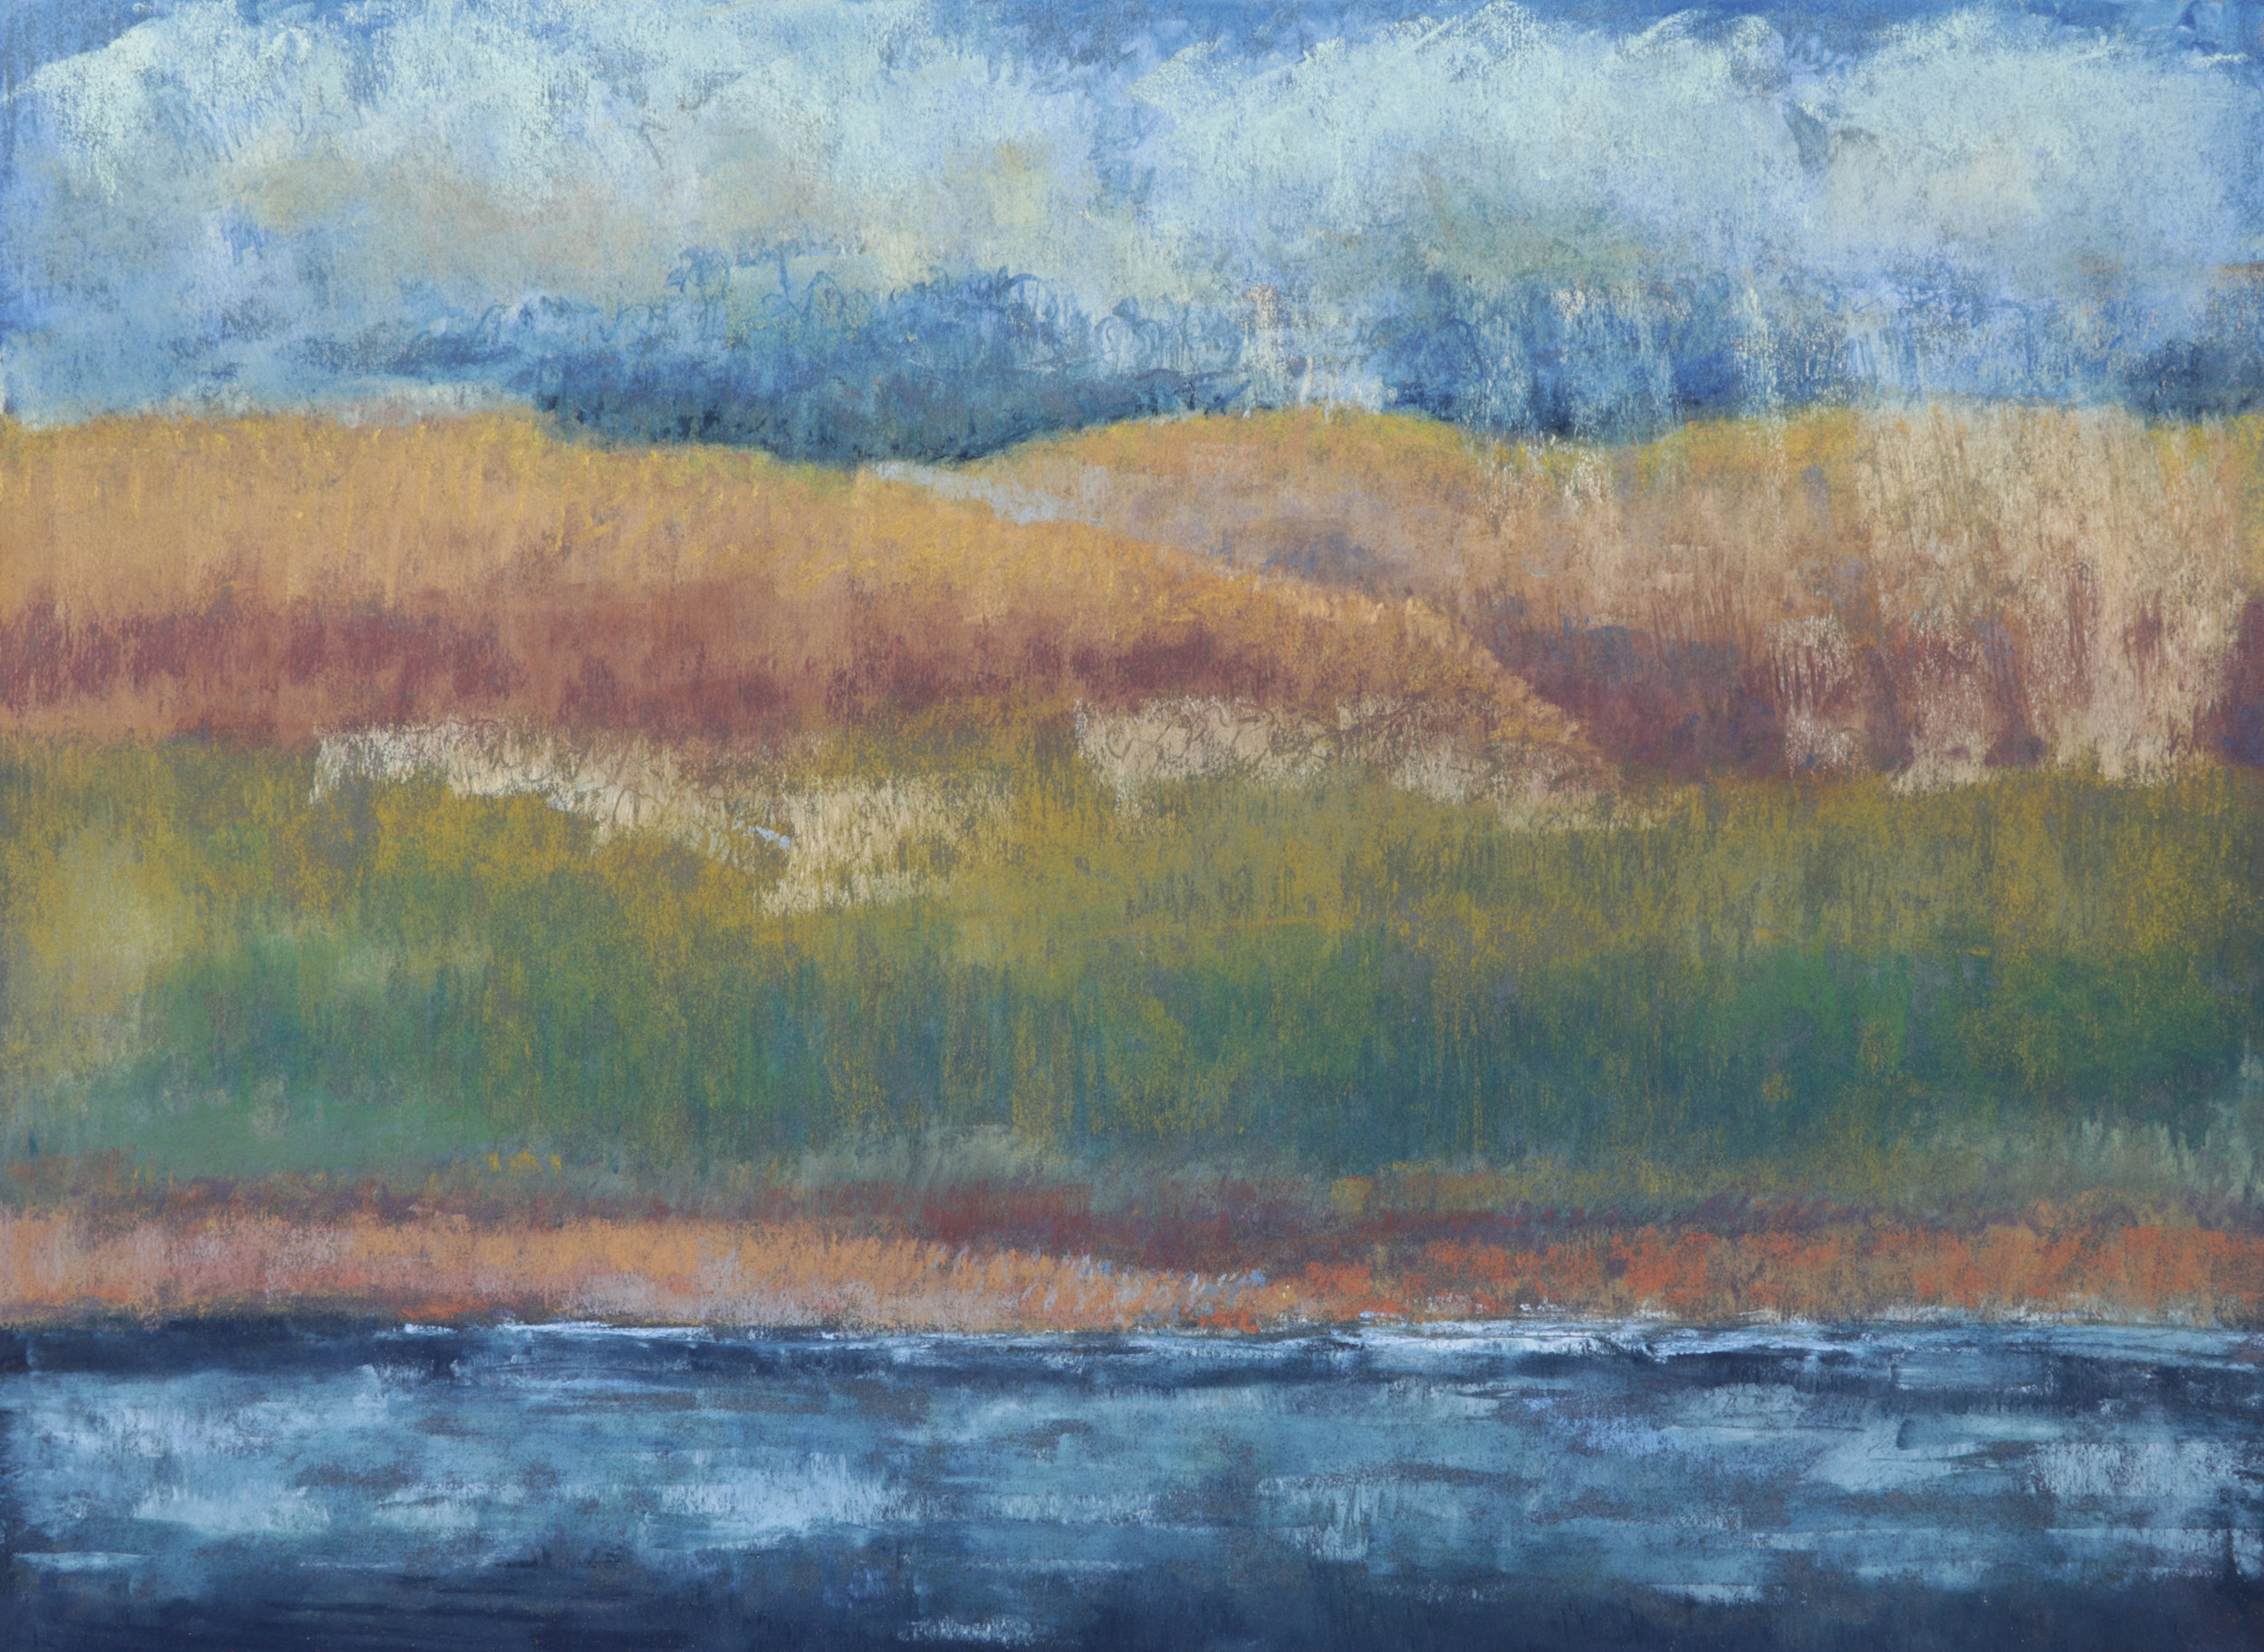 Far Shore No. 2 12x16 Soft Pastel